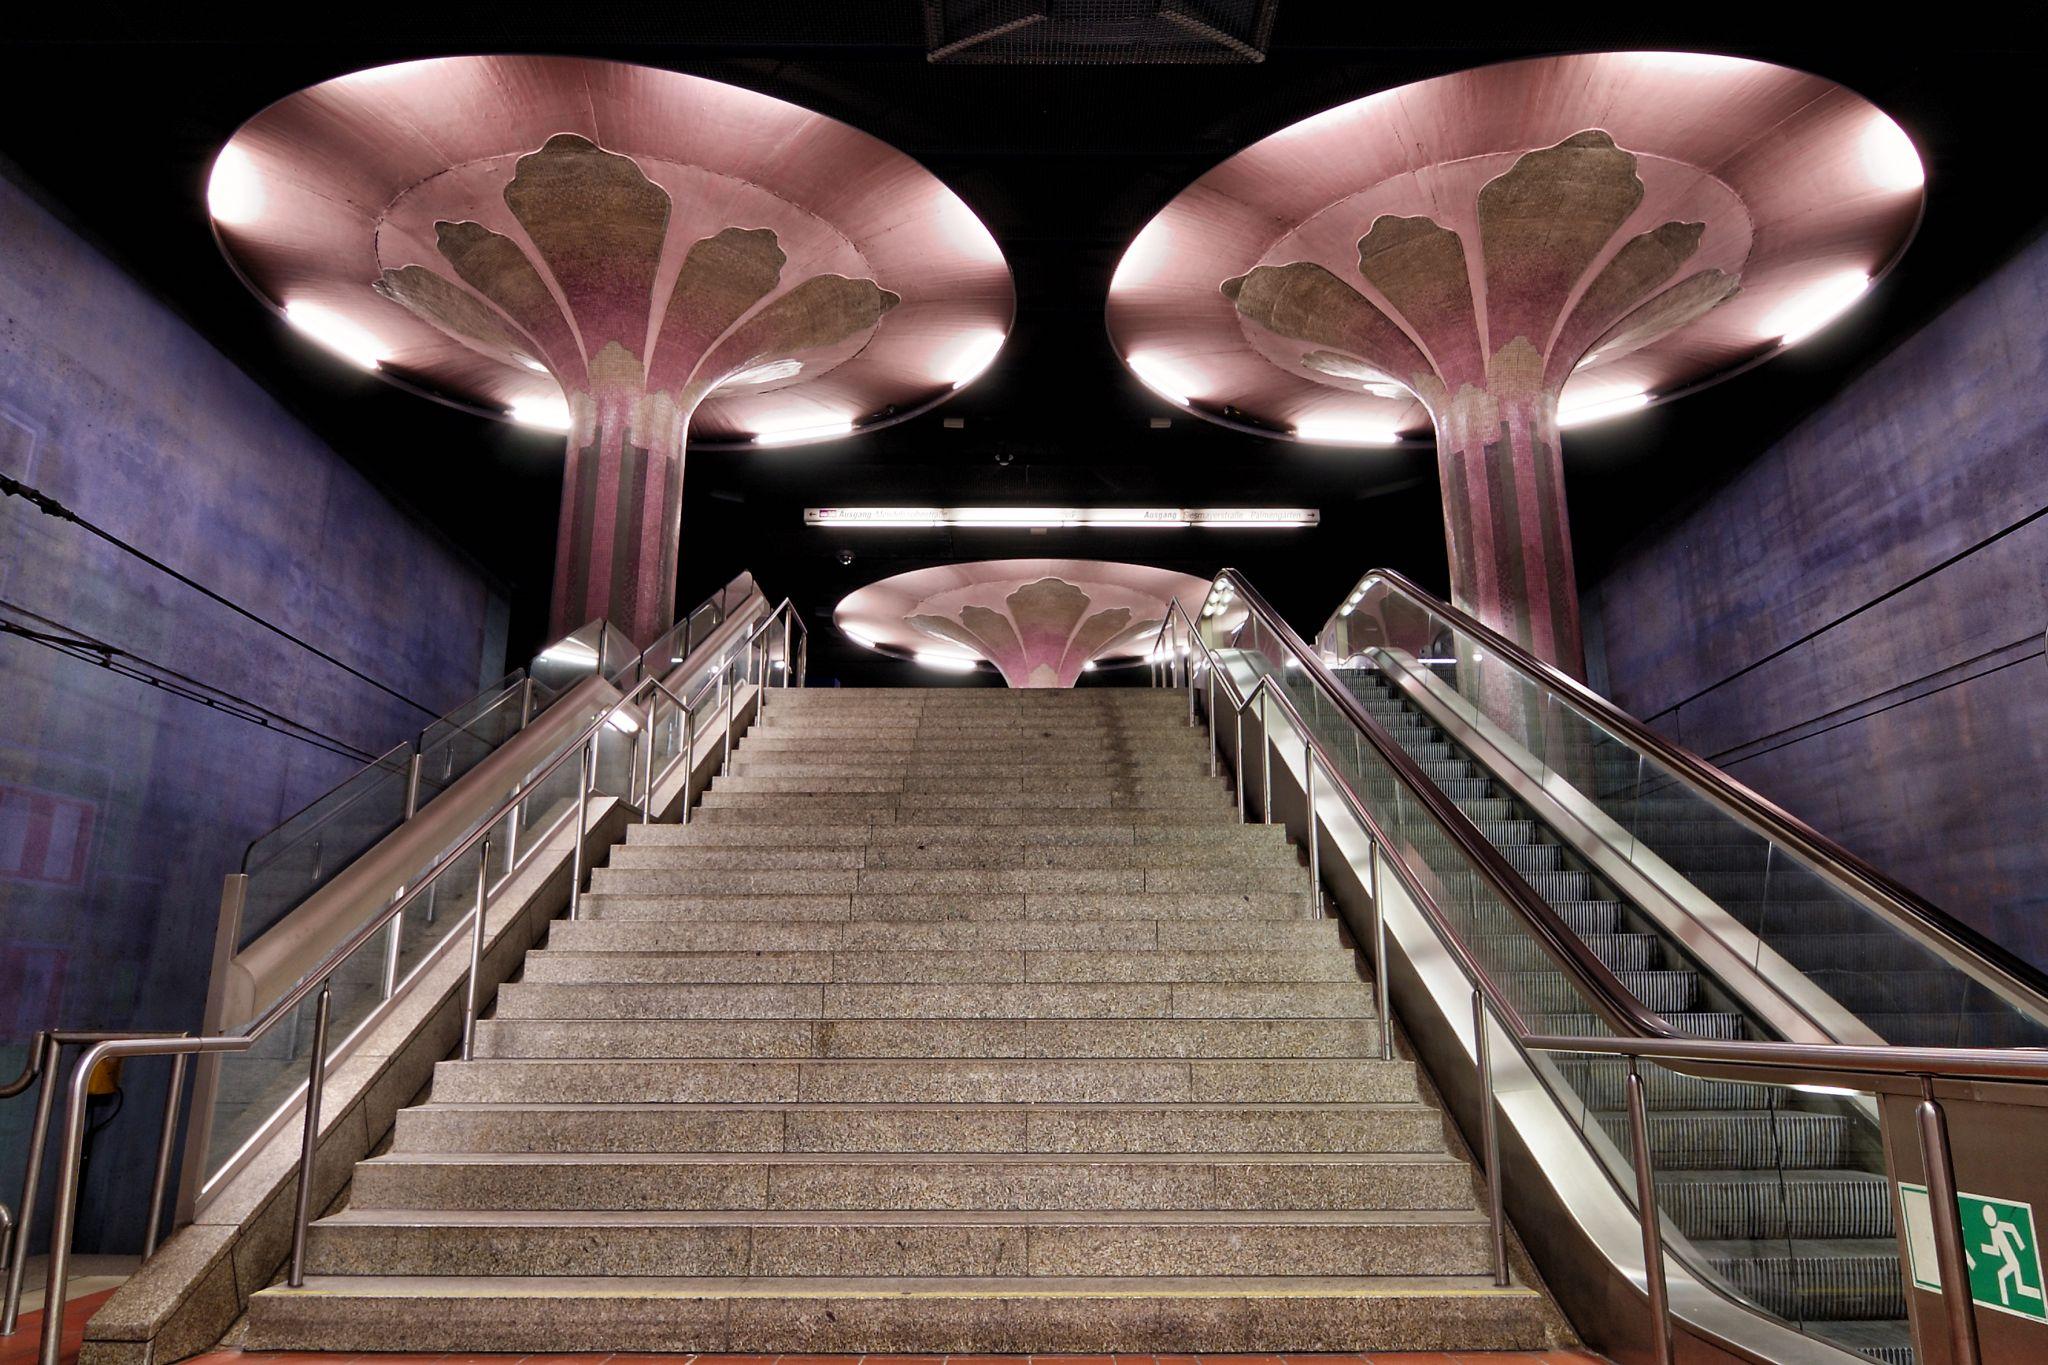 Frankfurt, U-Bahnstation Westend, Germany